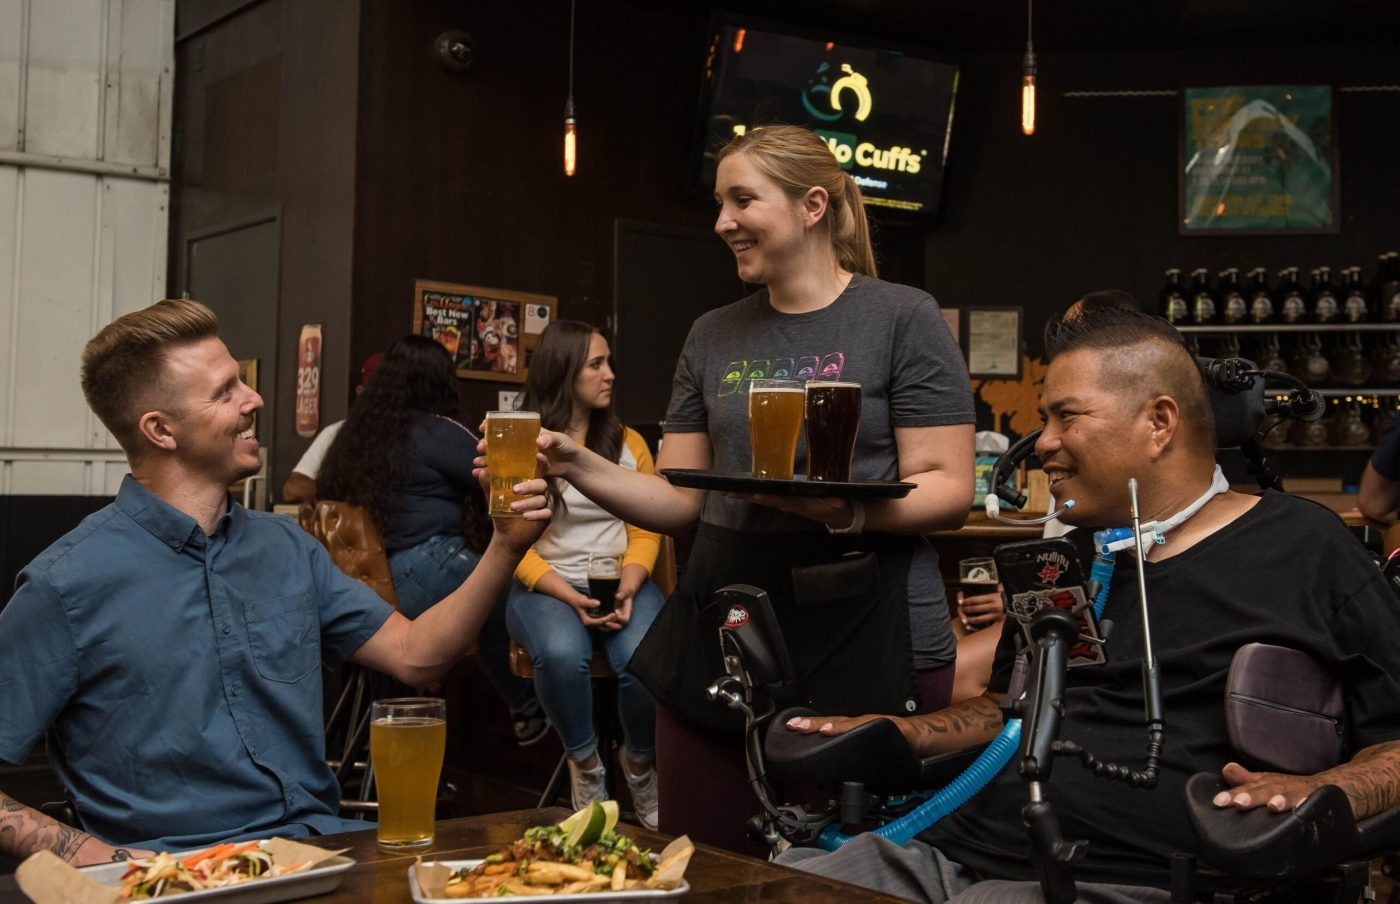 woman-serving-beer-at-a-bar-3009793